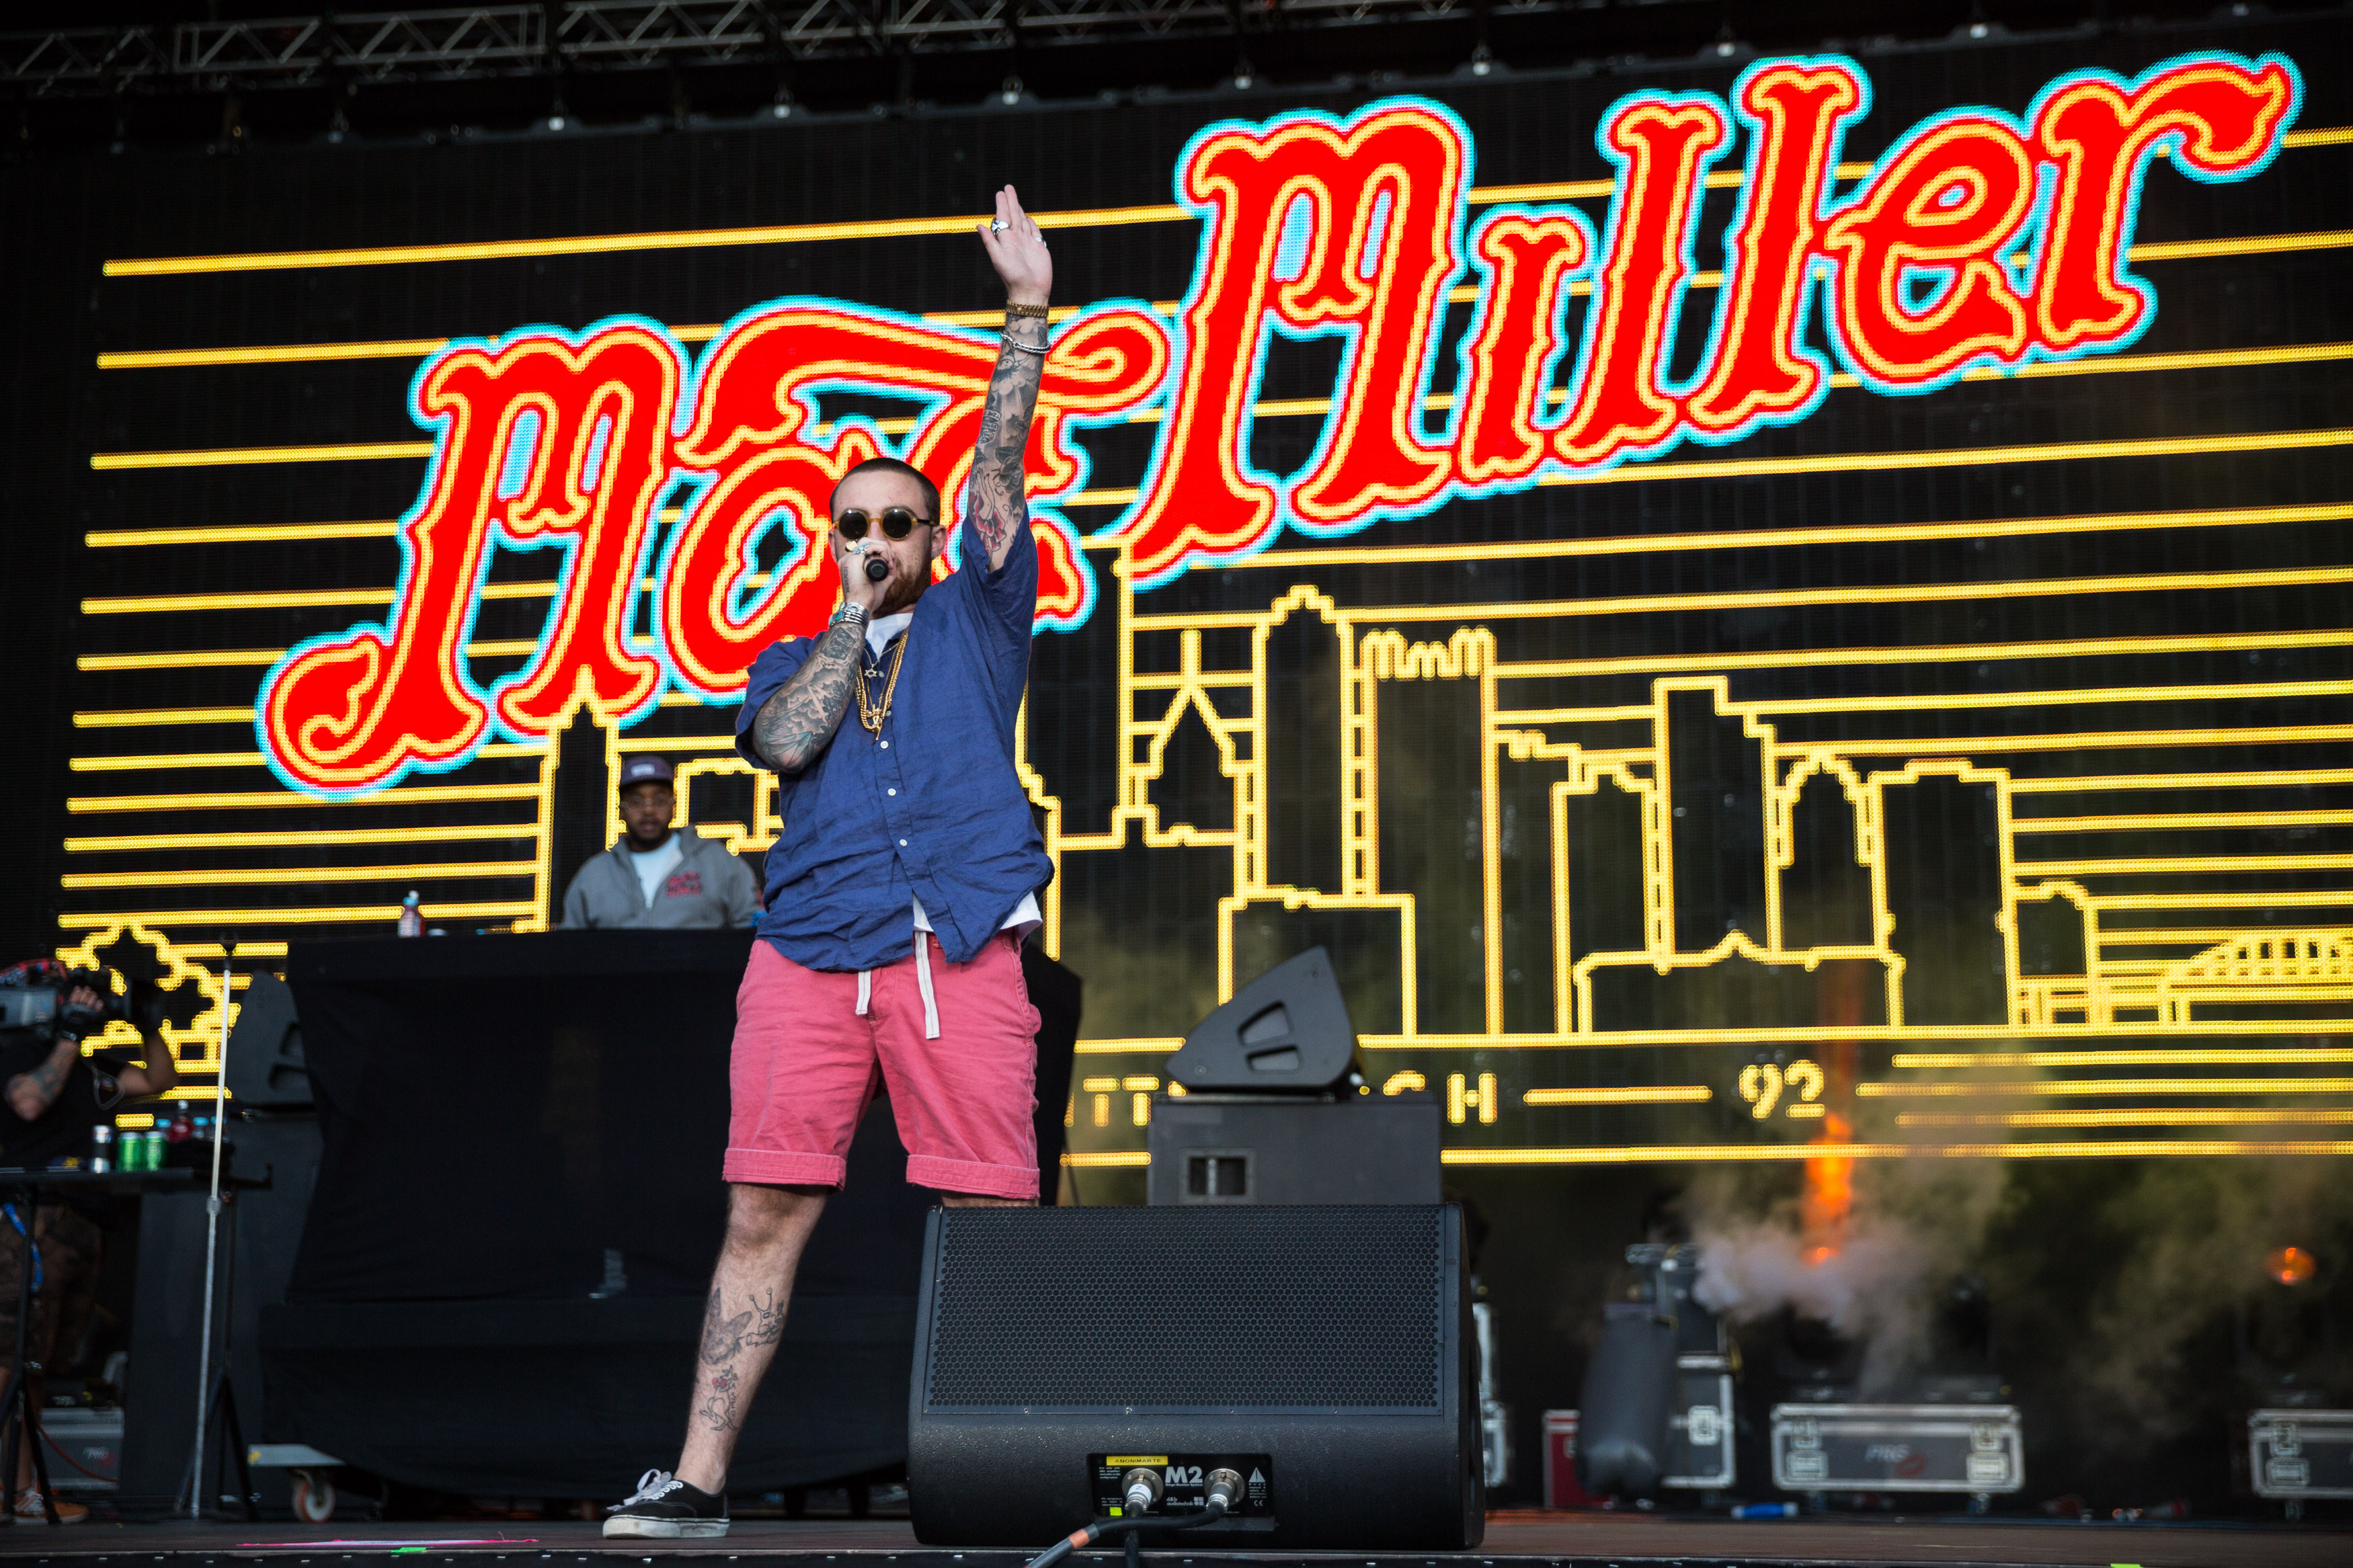 EXCLUSIVE: Mac Miller's Alleged Drug Dealer's Trial Date Is Officially Set